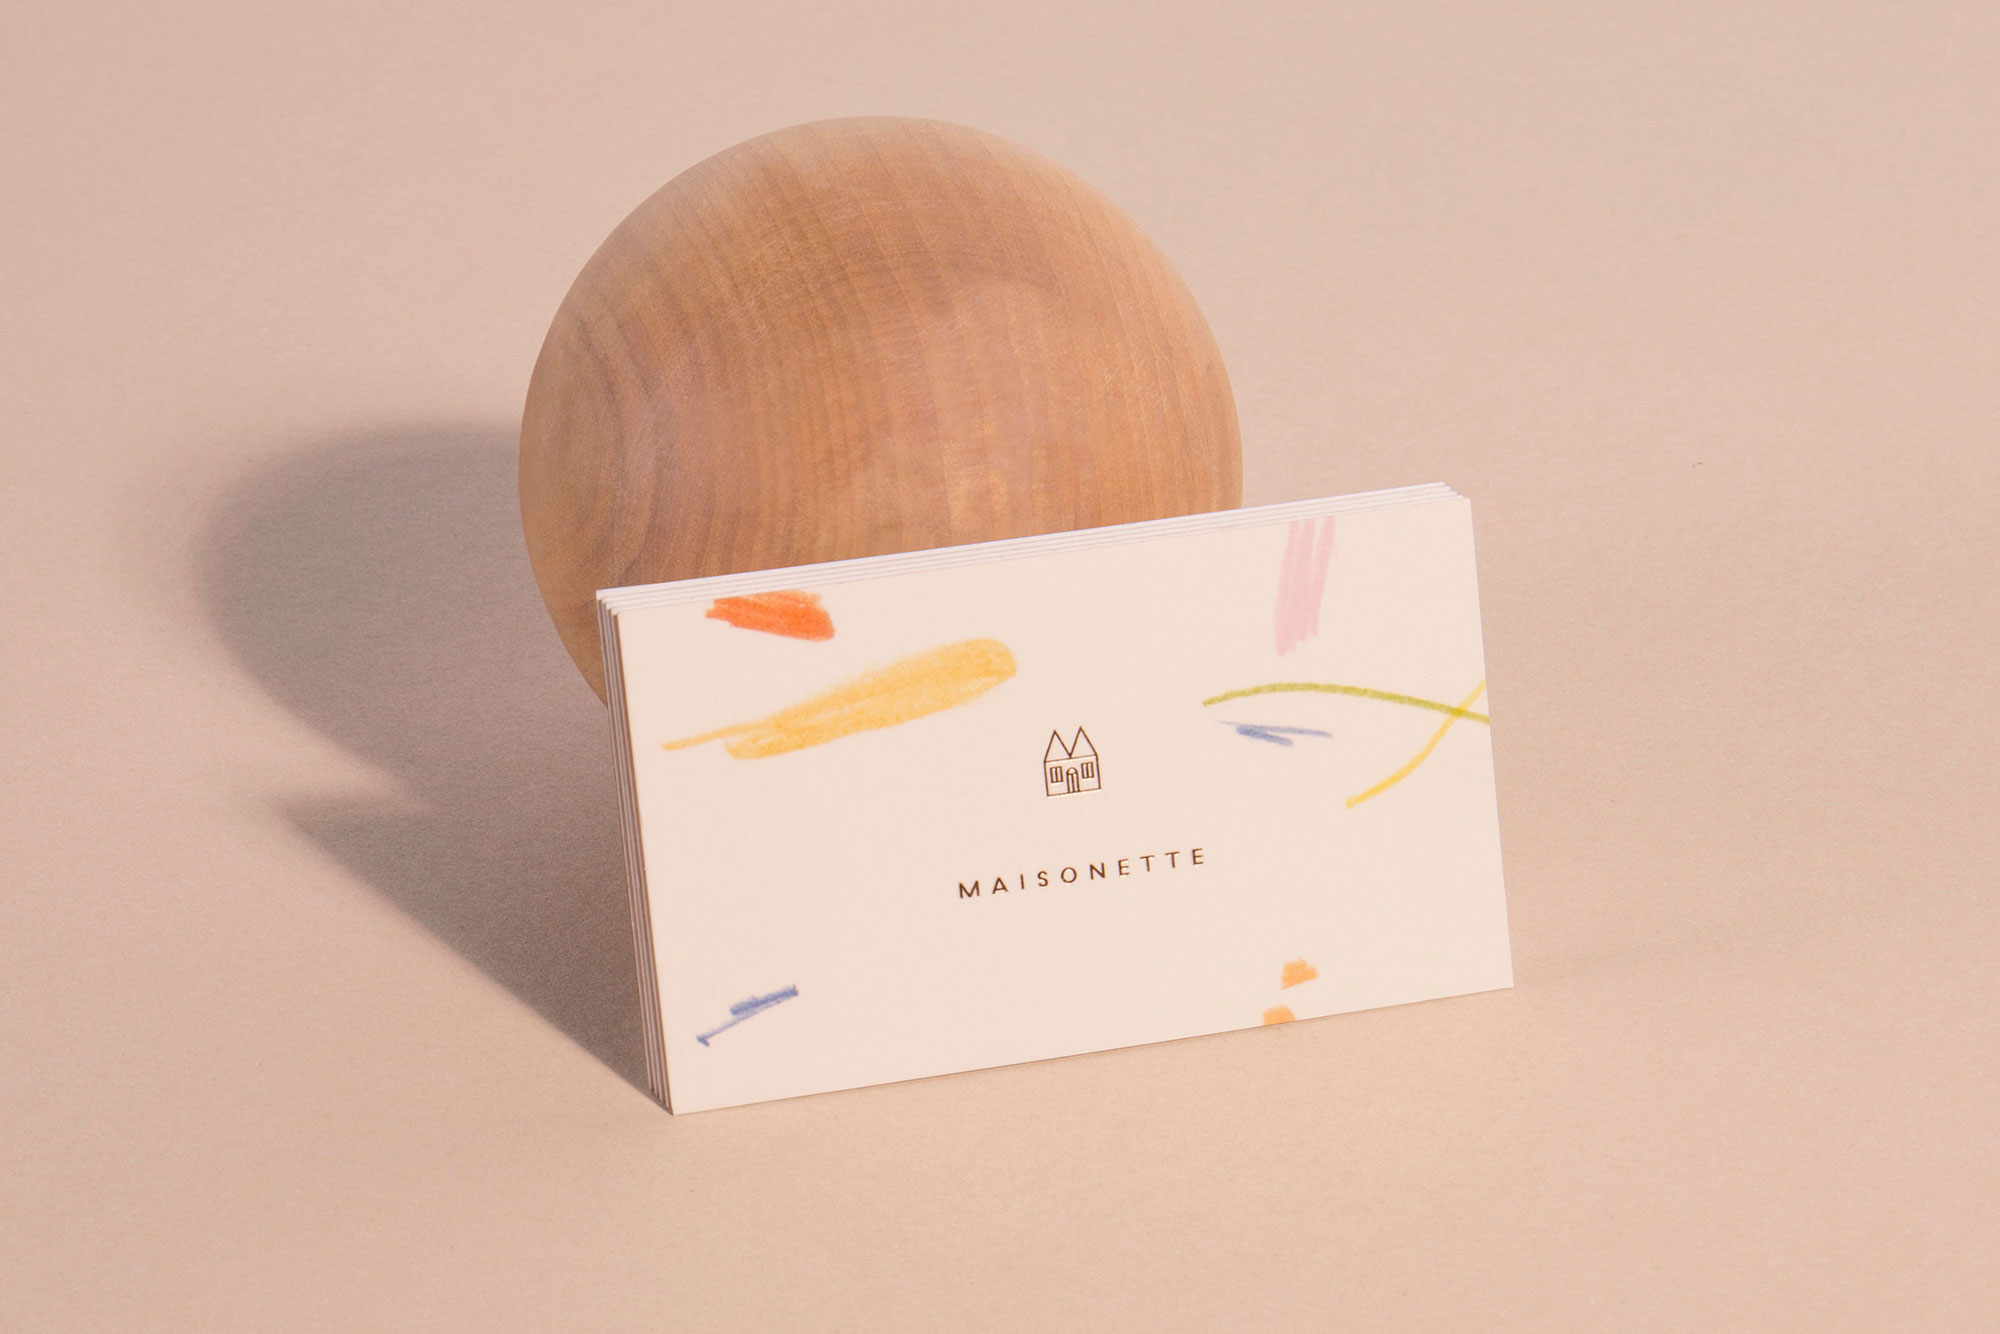 ma-card-01-2000px.jpg